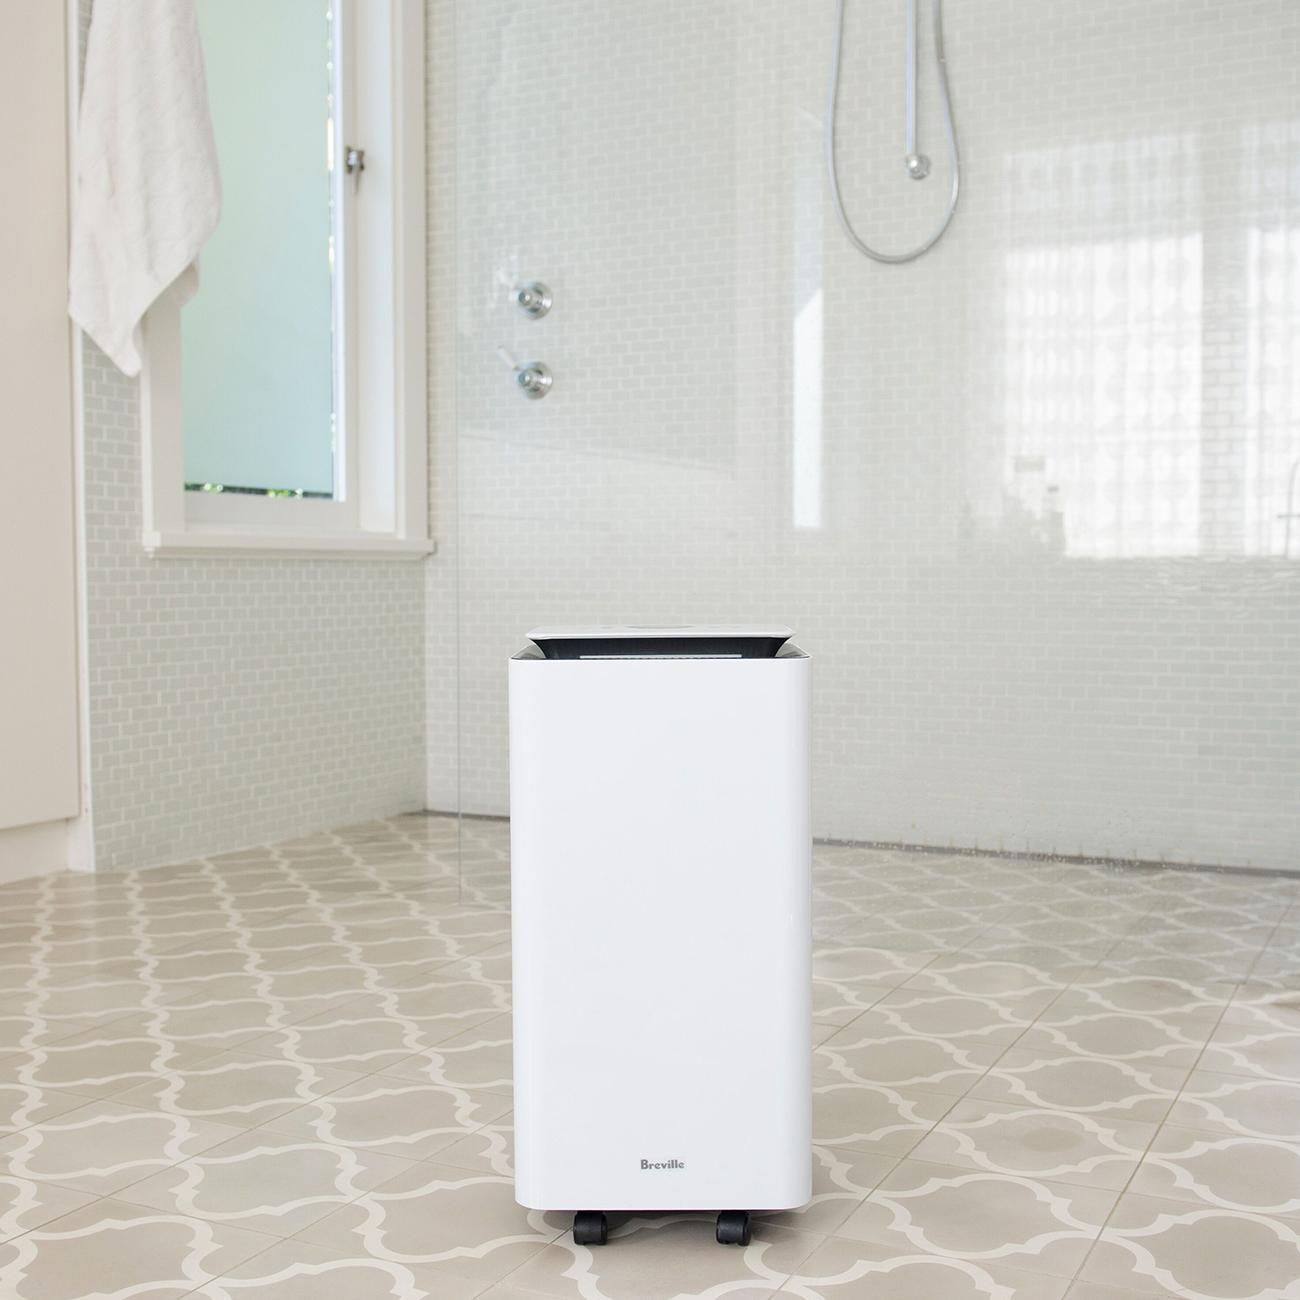 The Smart Dry Dehumidifier Breville